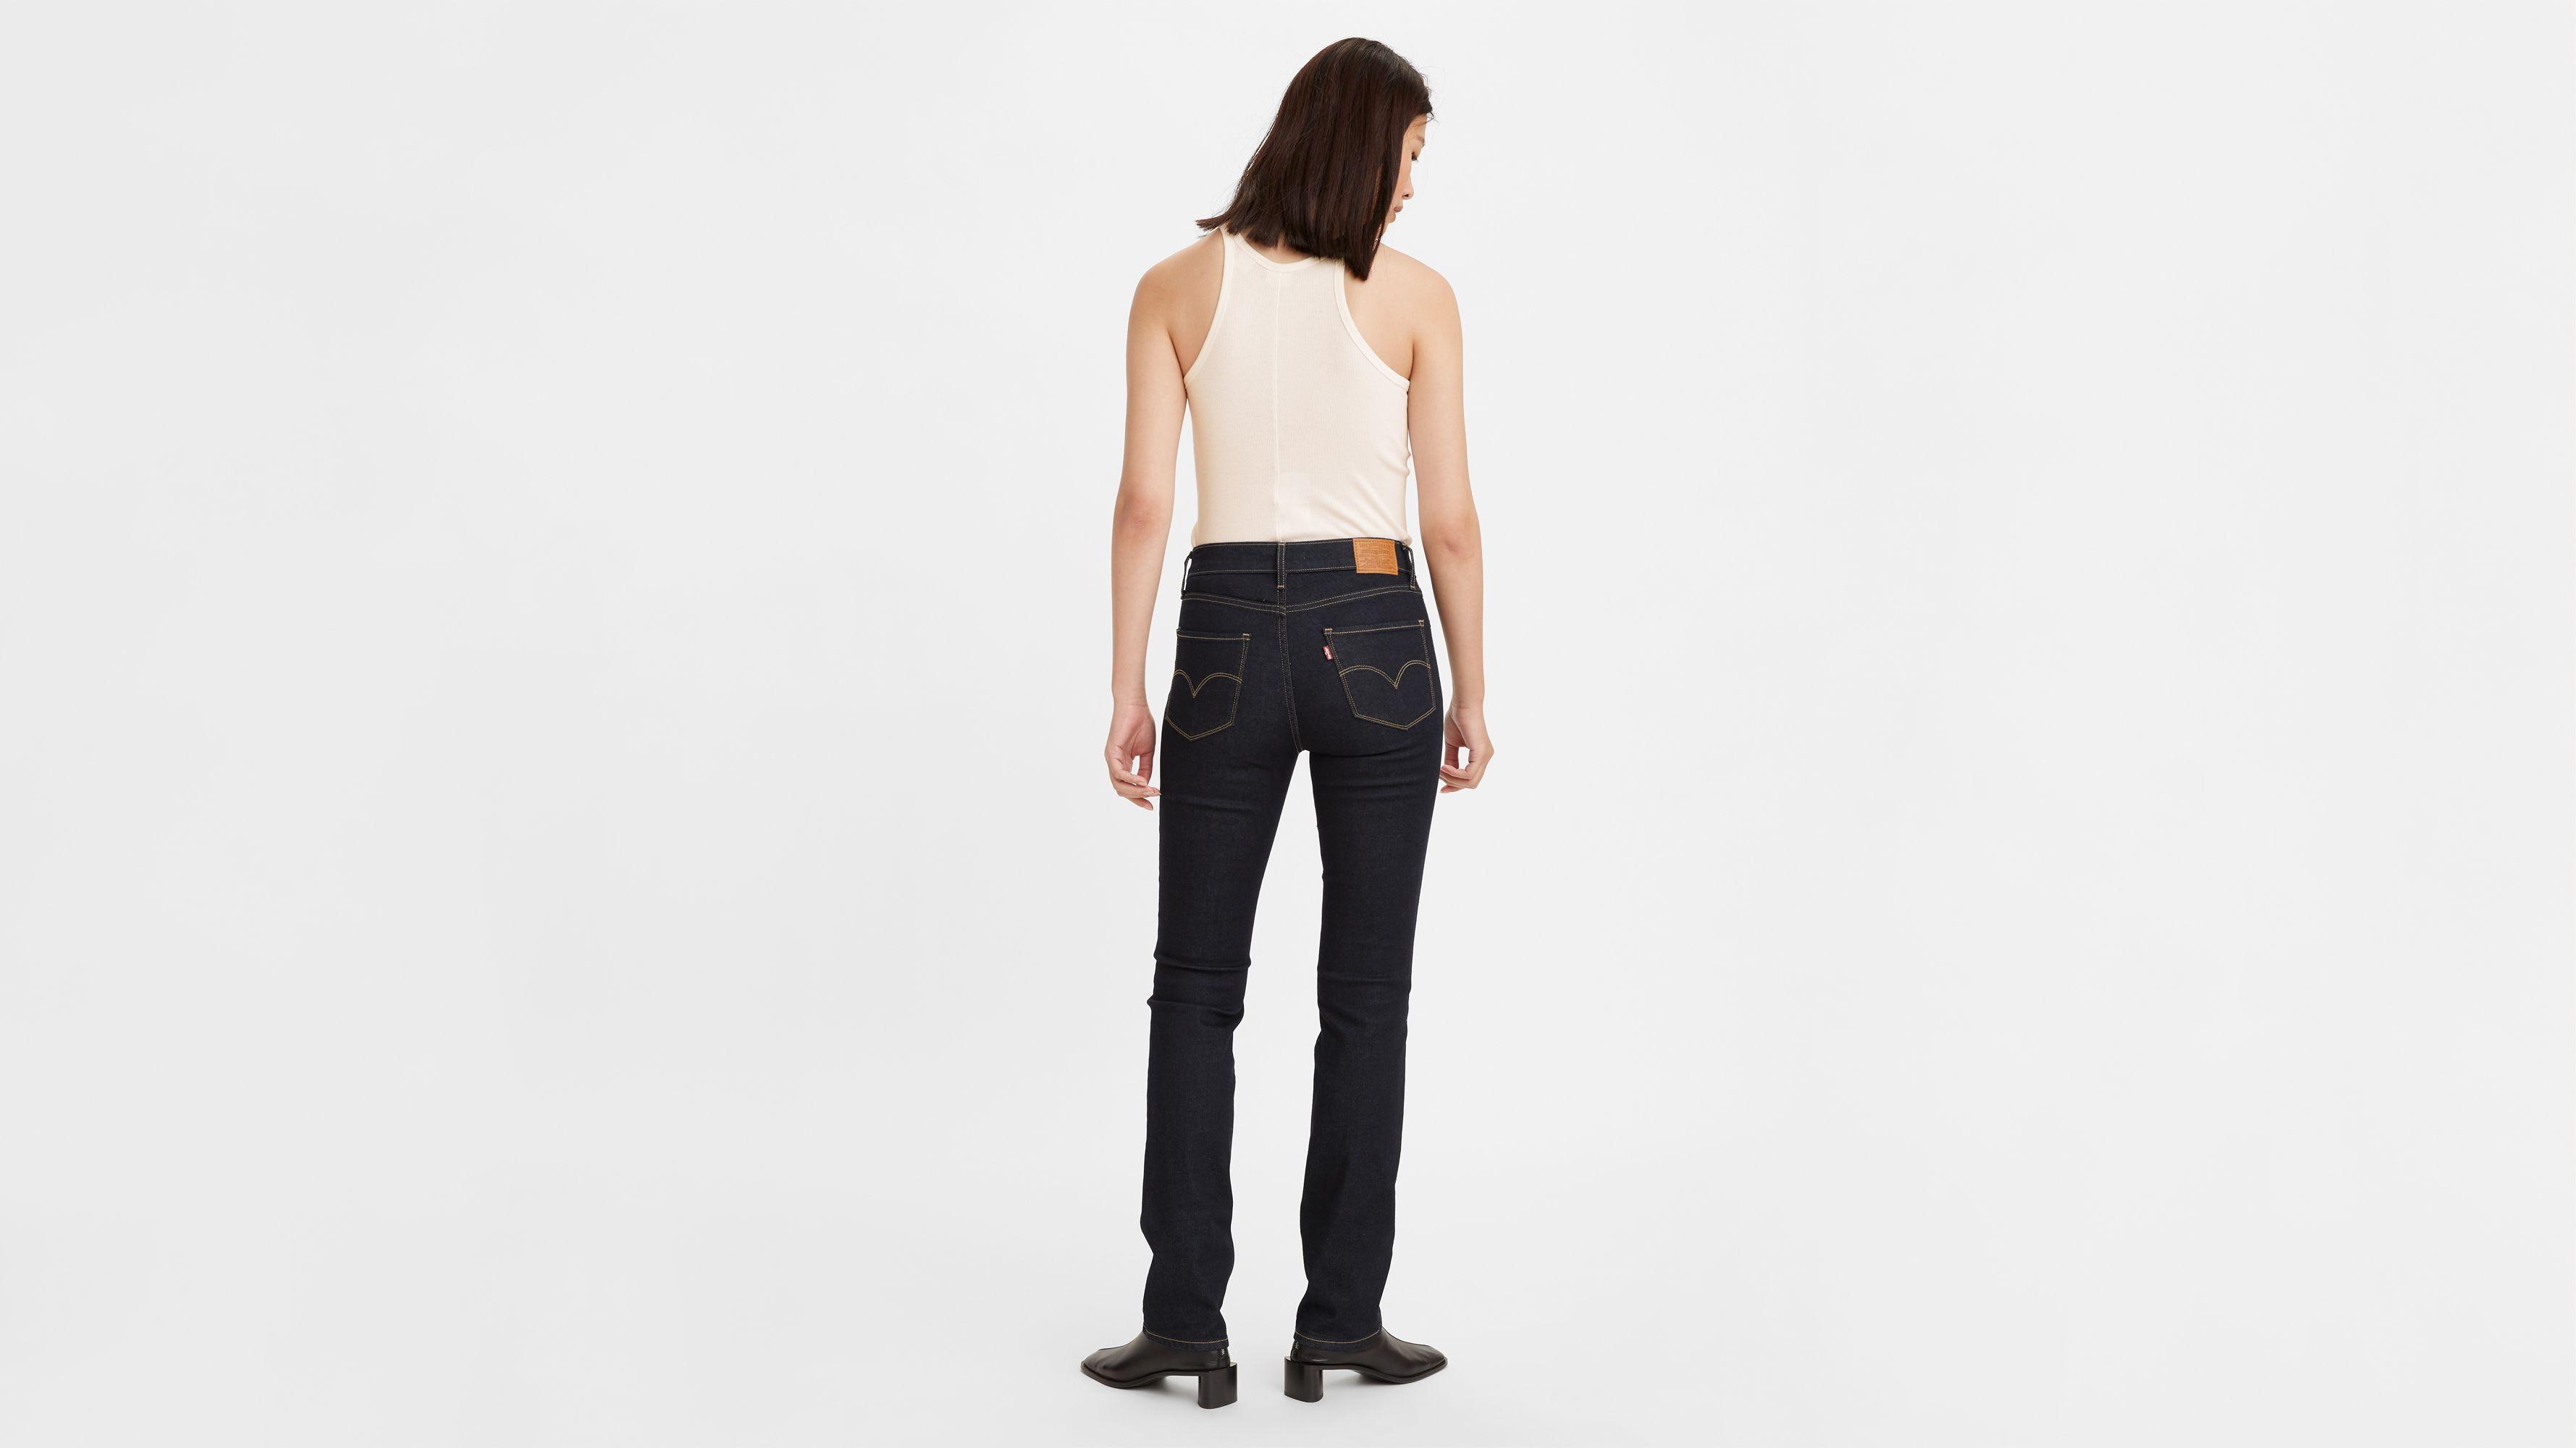 724™ High waisted Straight Jeans Bleu | Levi's® FR